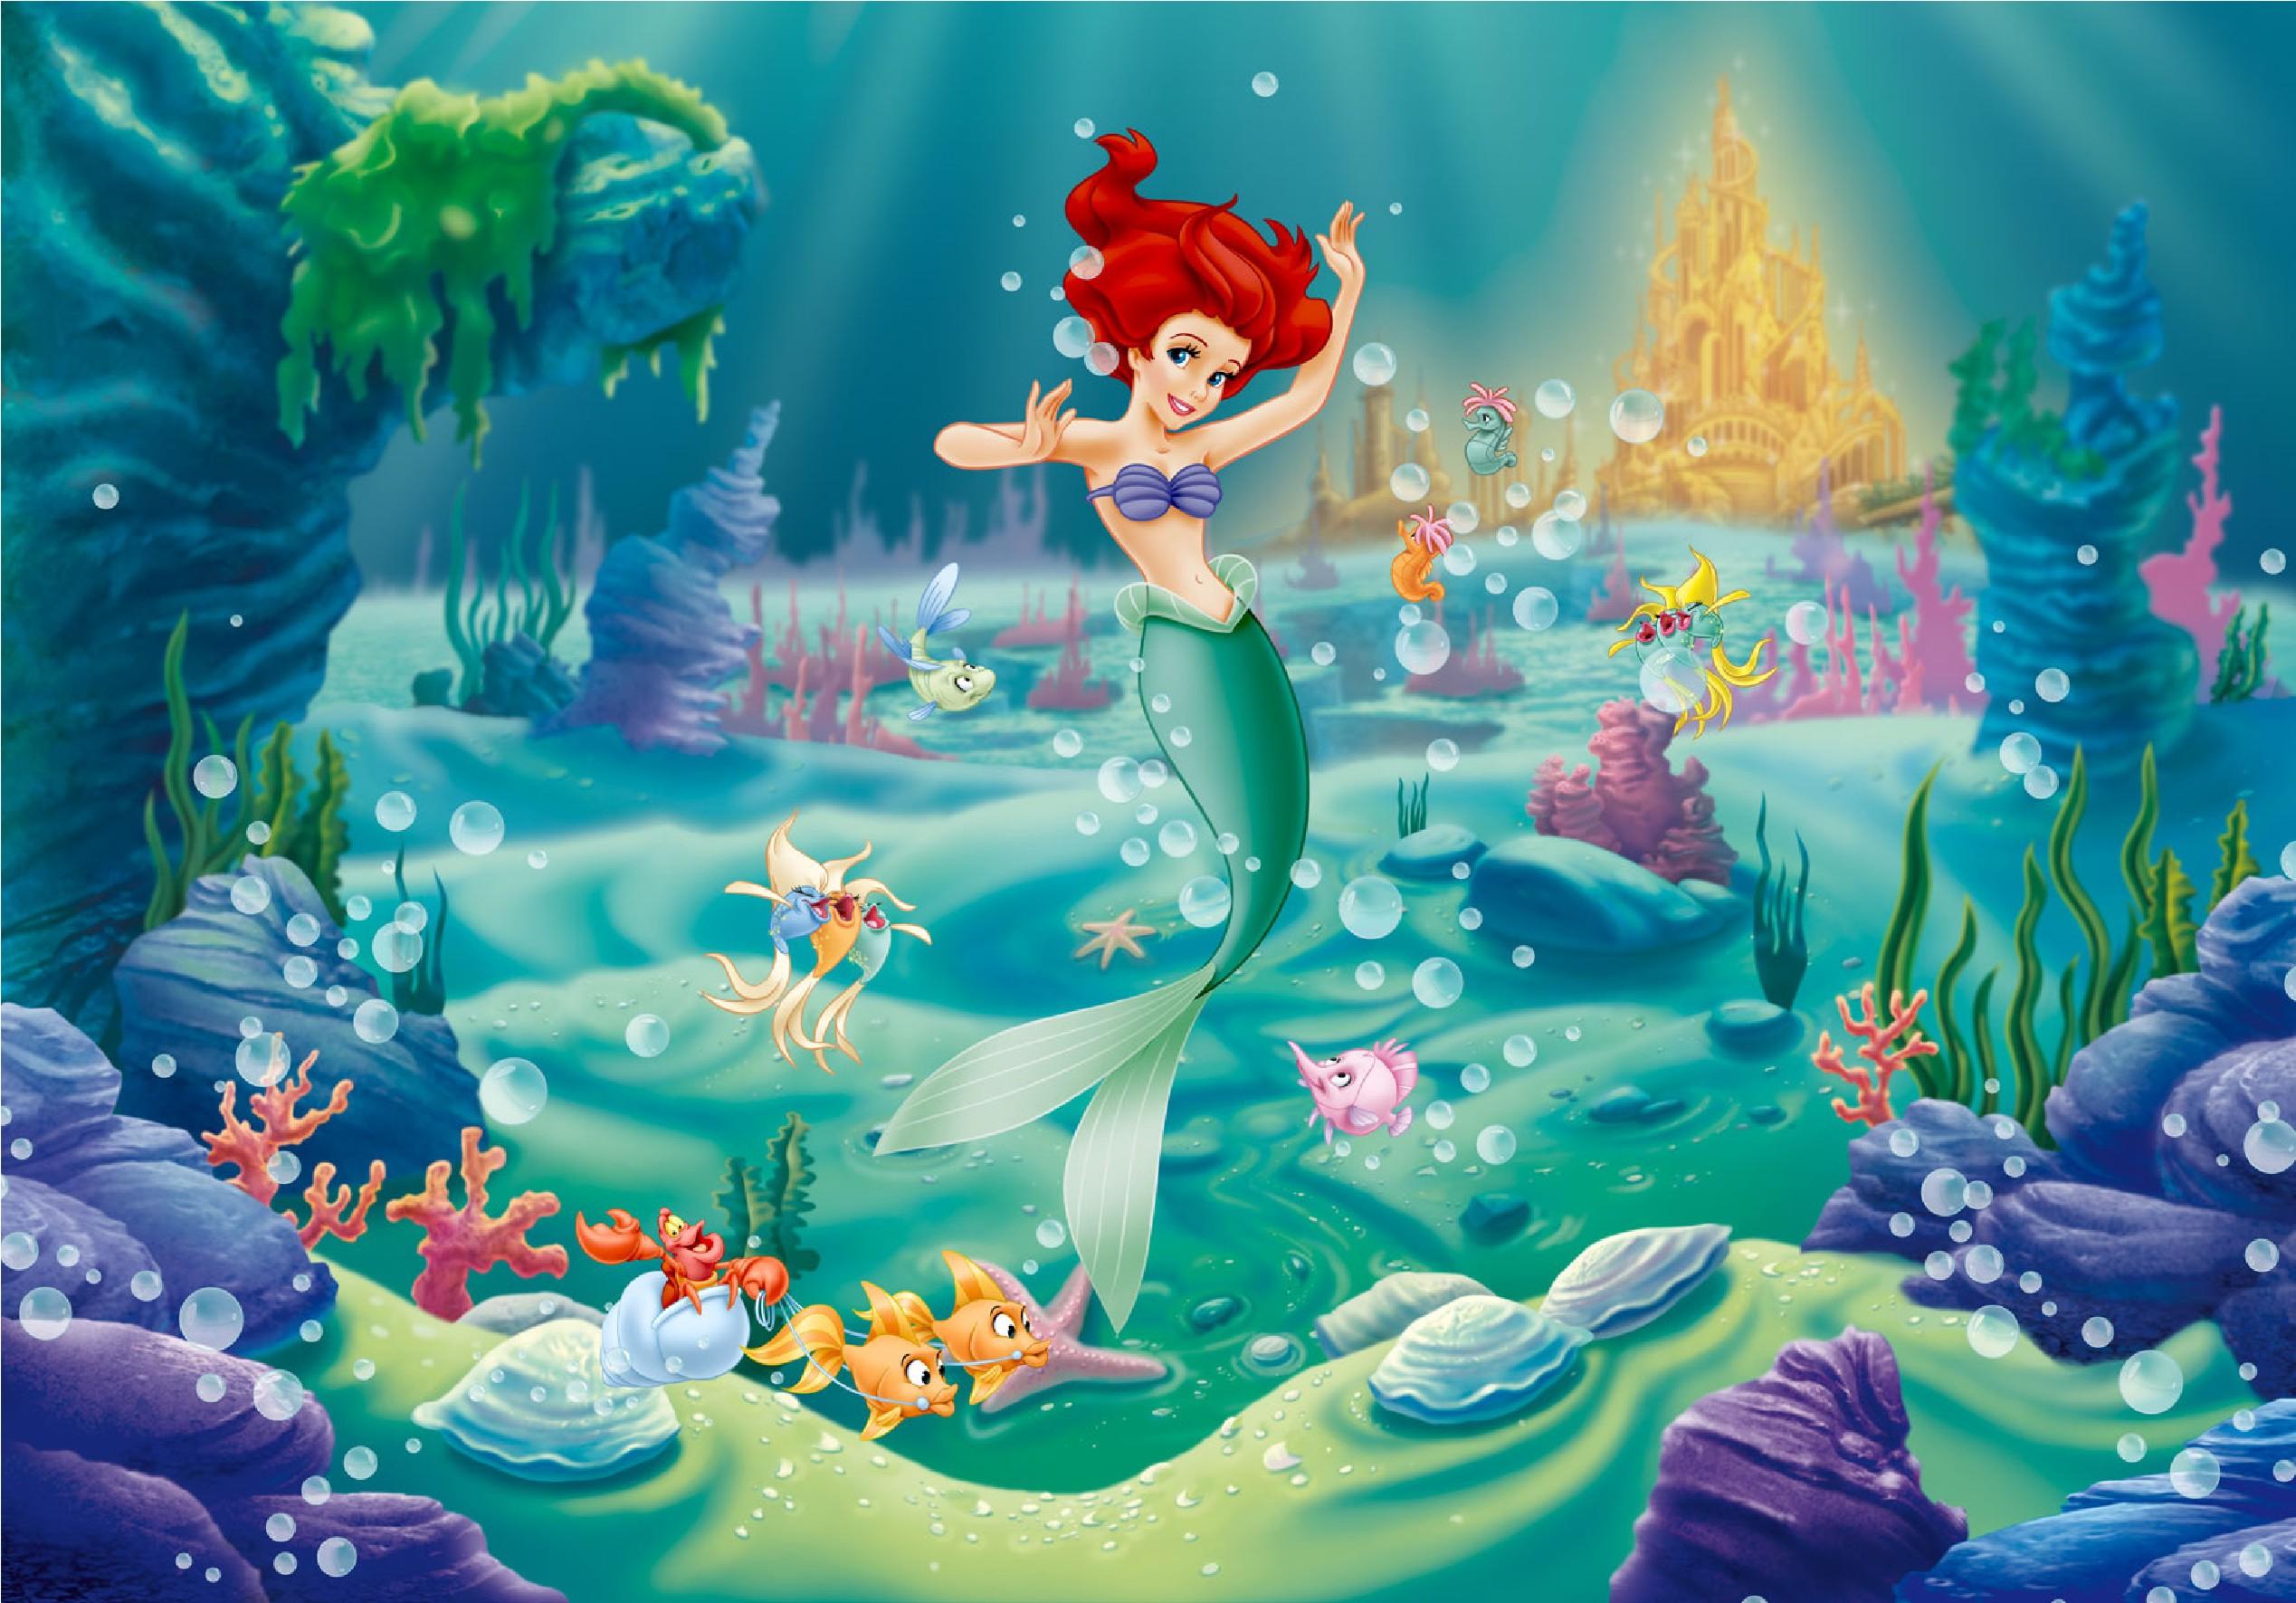 little mermaid images - HD2537×1771